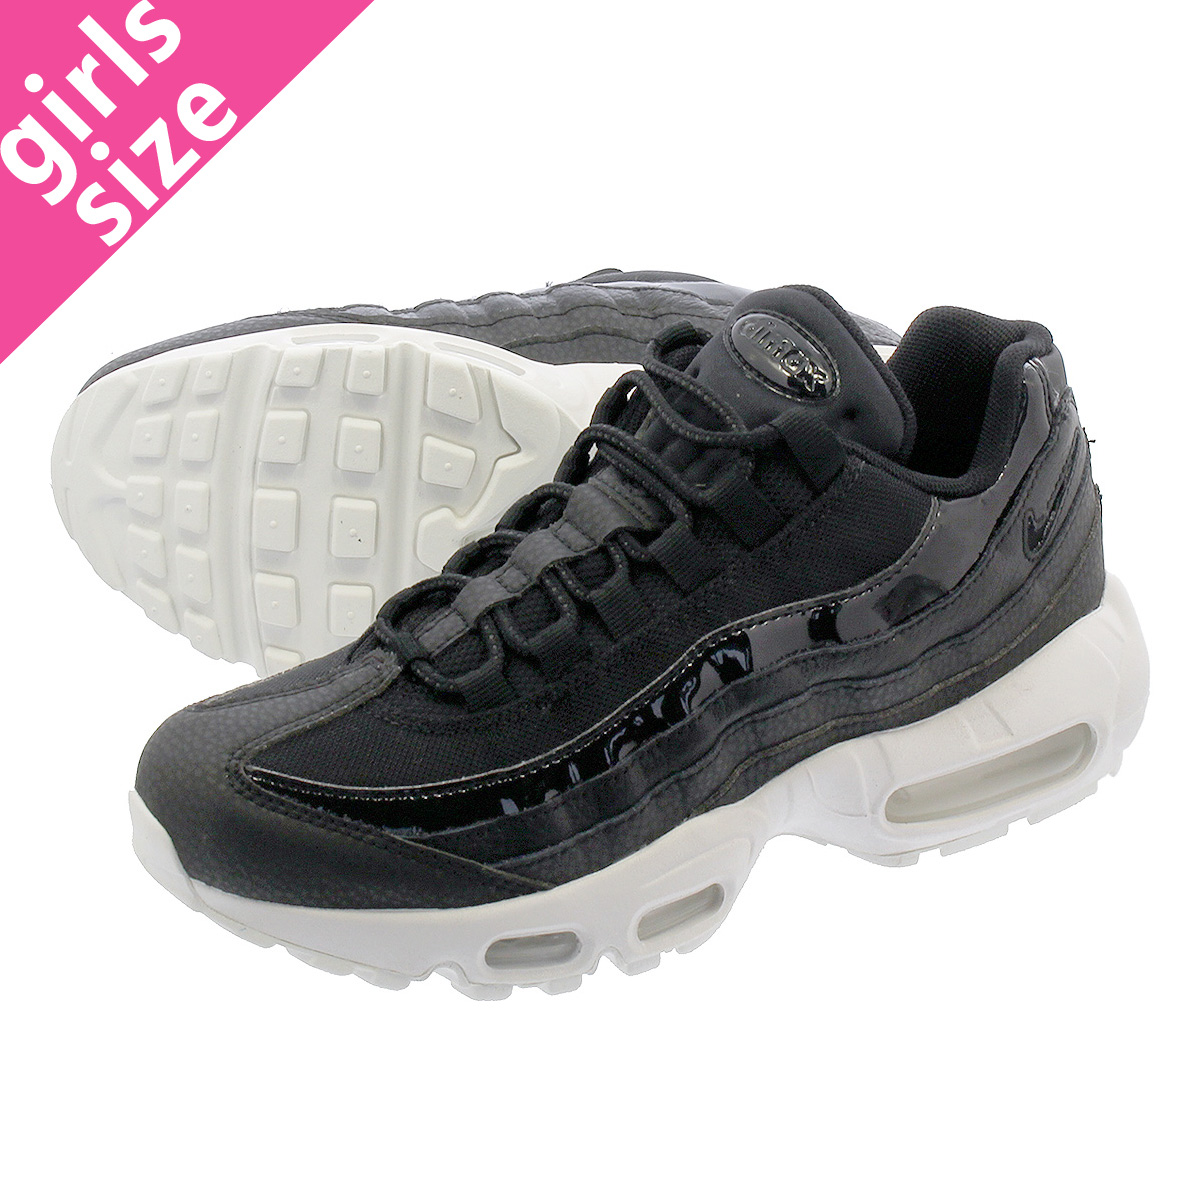 2ea8f04546 LOWTEX PLUS: NIKE WMNS AIR MAX 95 SE Nike women Air Max 95 SE BLACK/BLACK/ SUMMIT WHITE/PLATINUM TINT aq4138-001 | Rakuten Global Market